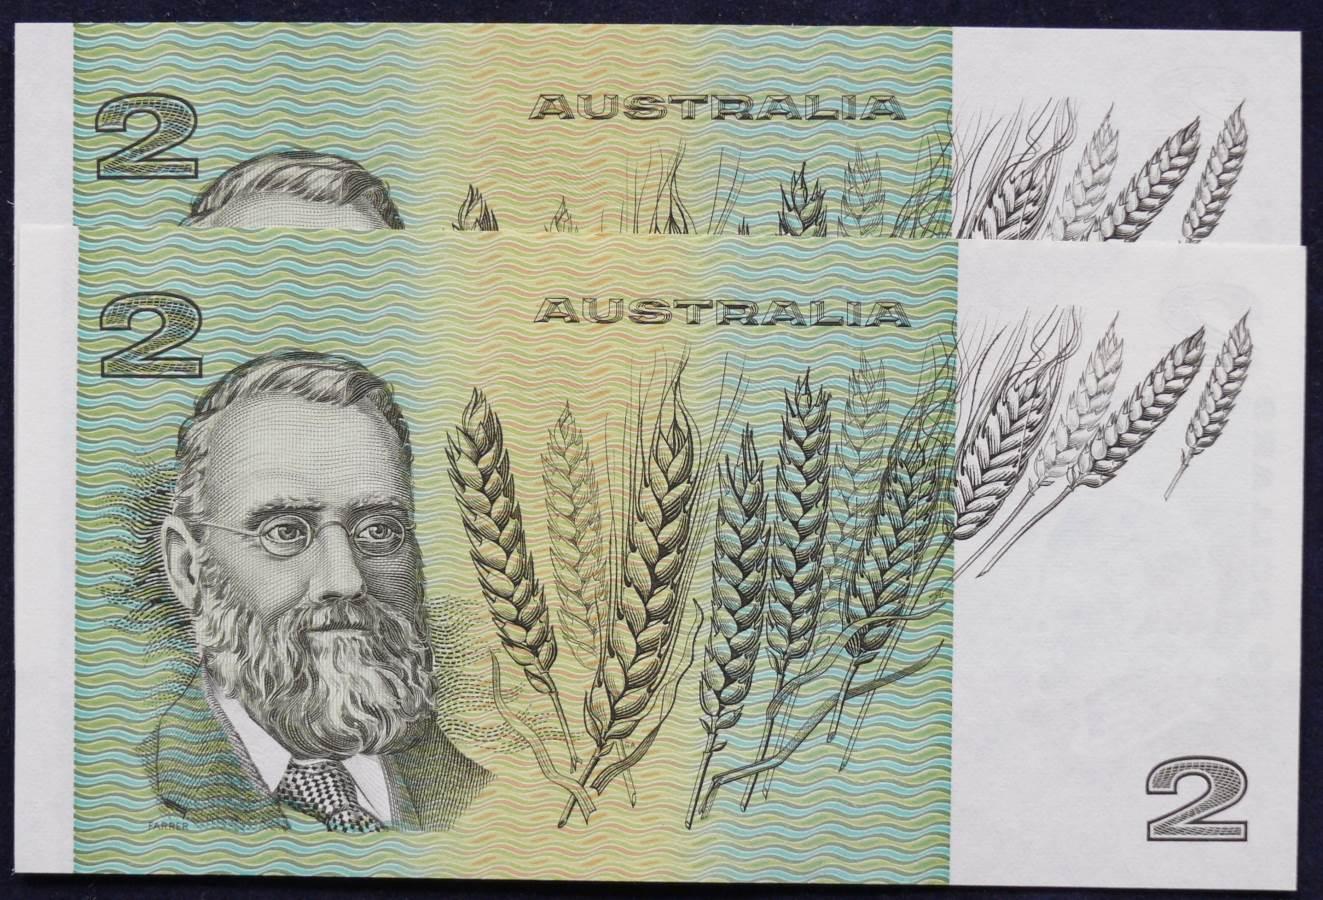 1985 Australia Two Dollars x 2 - LGS